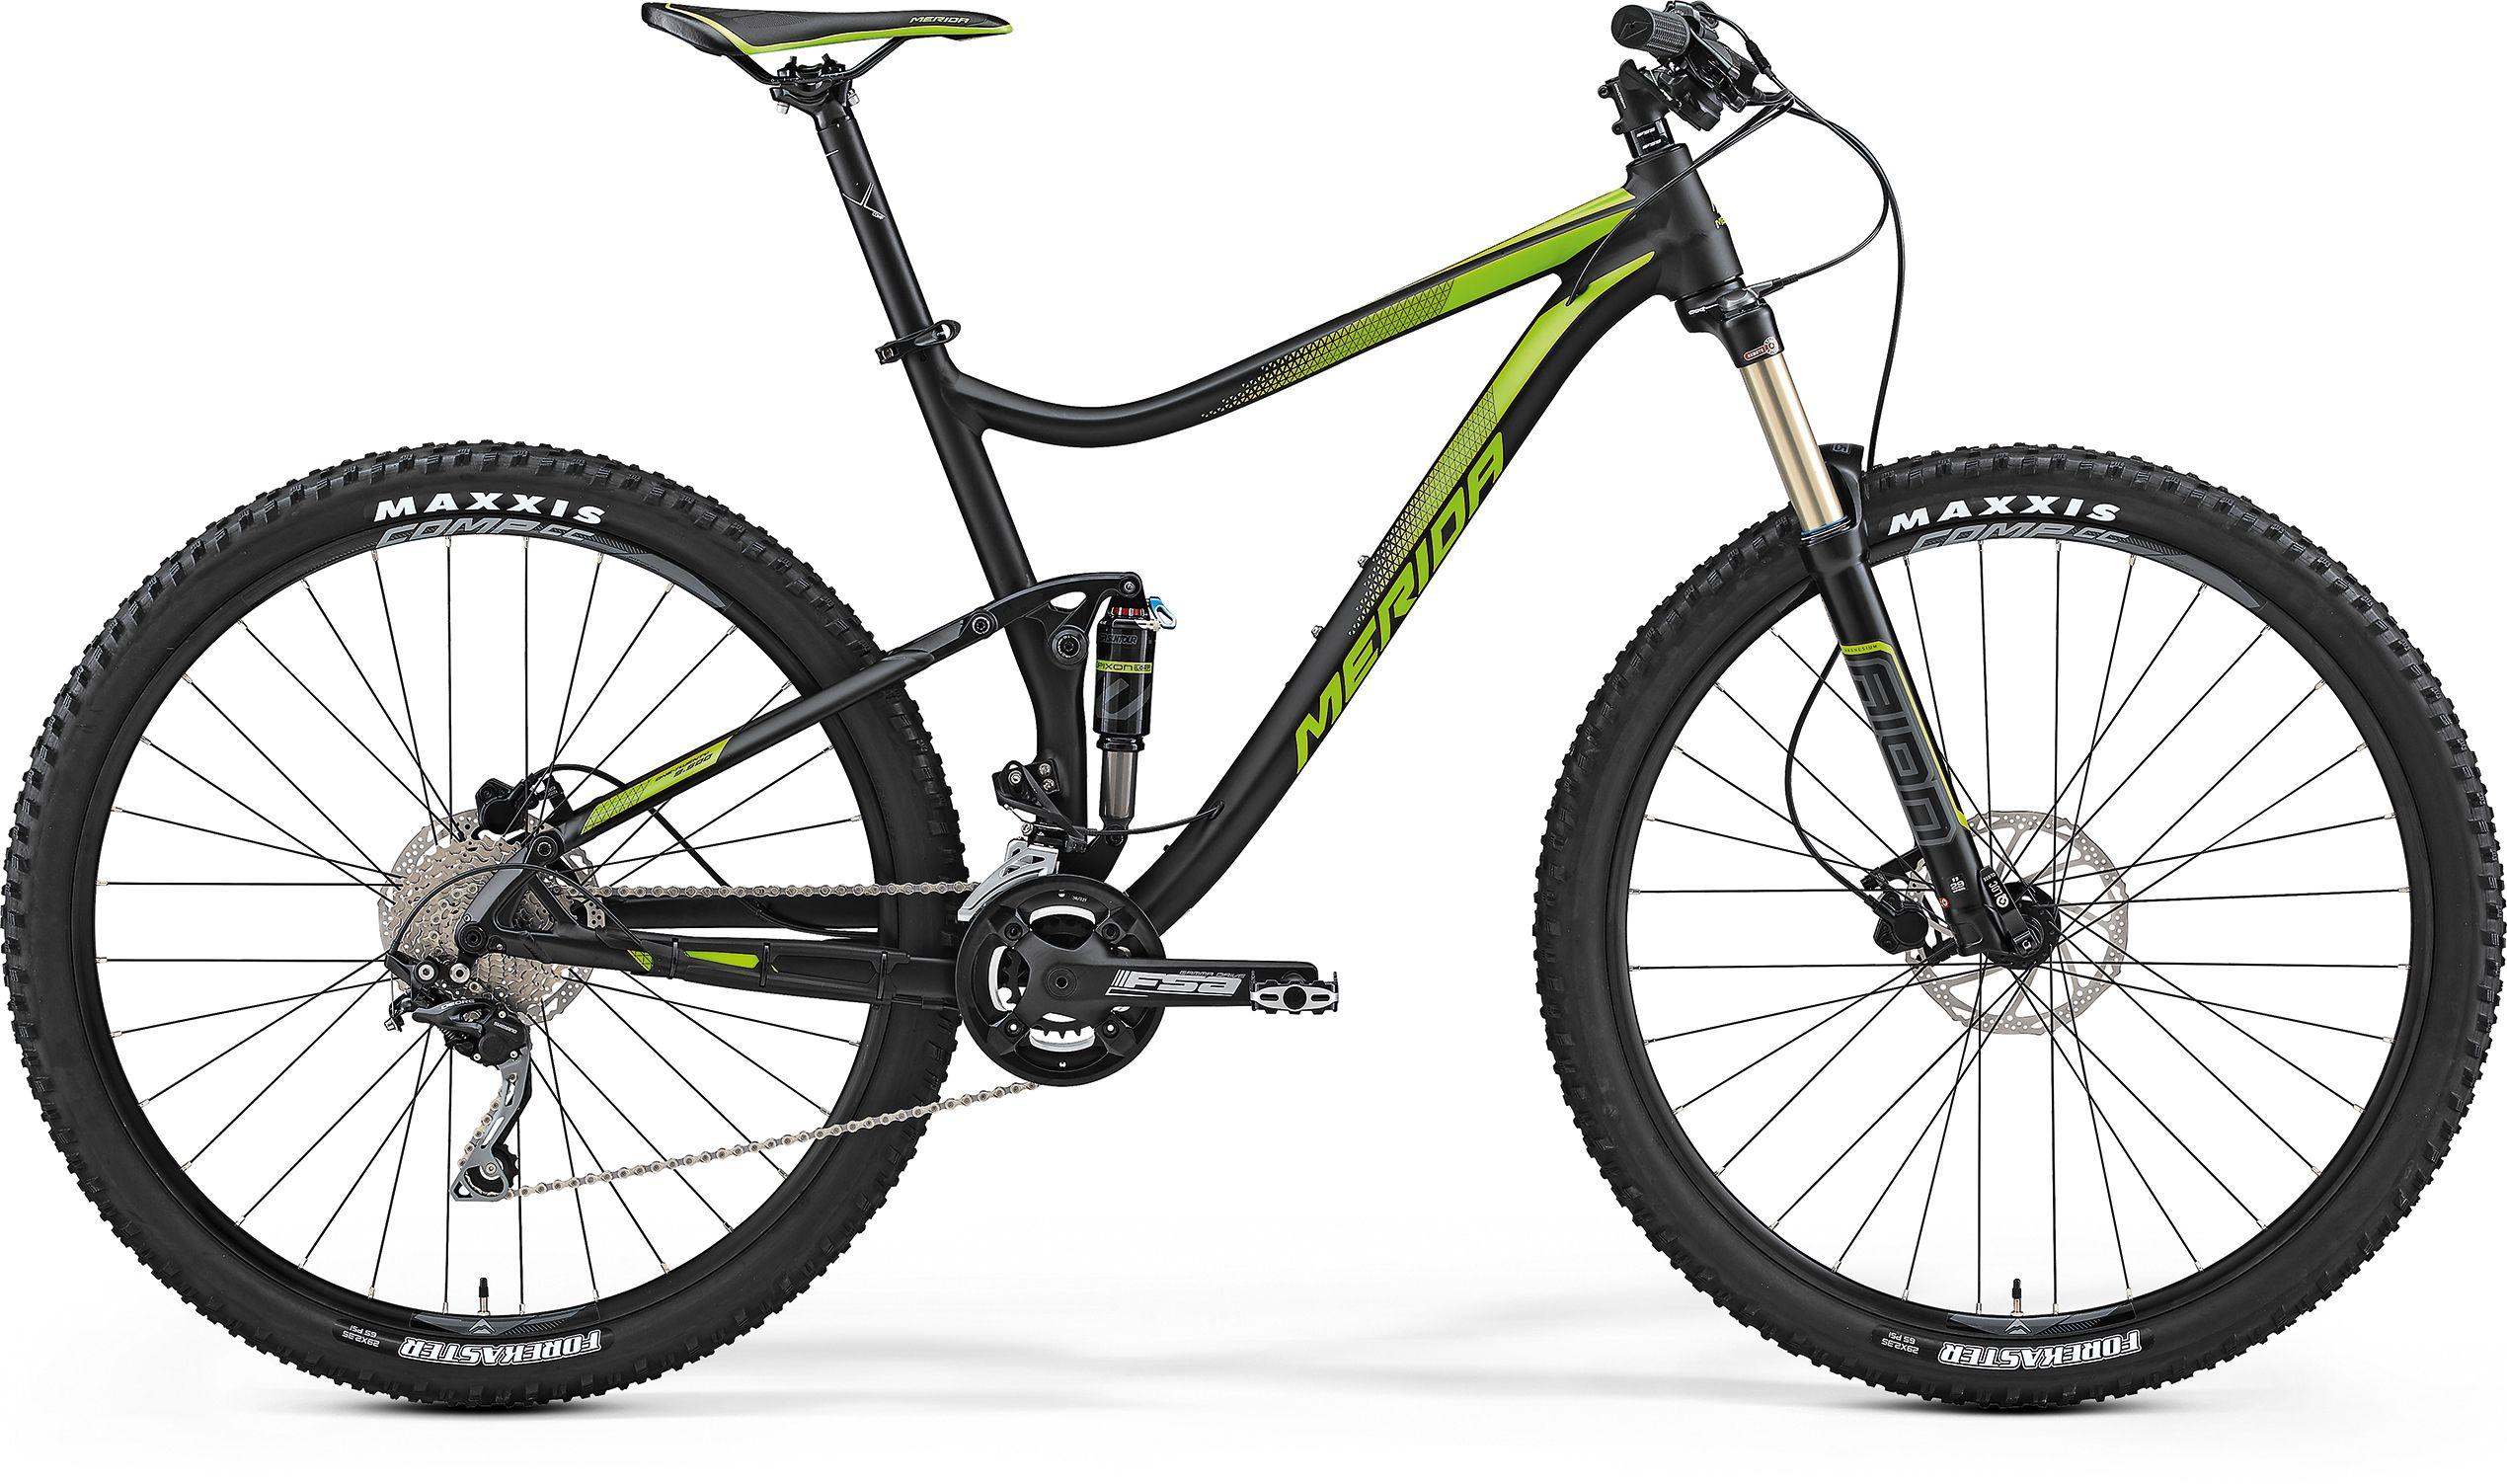 Велосипед Merida One-Twenty 9.500 2017,  Двухподвесы  - артикул:274473